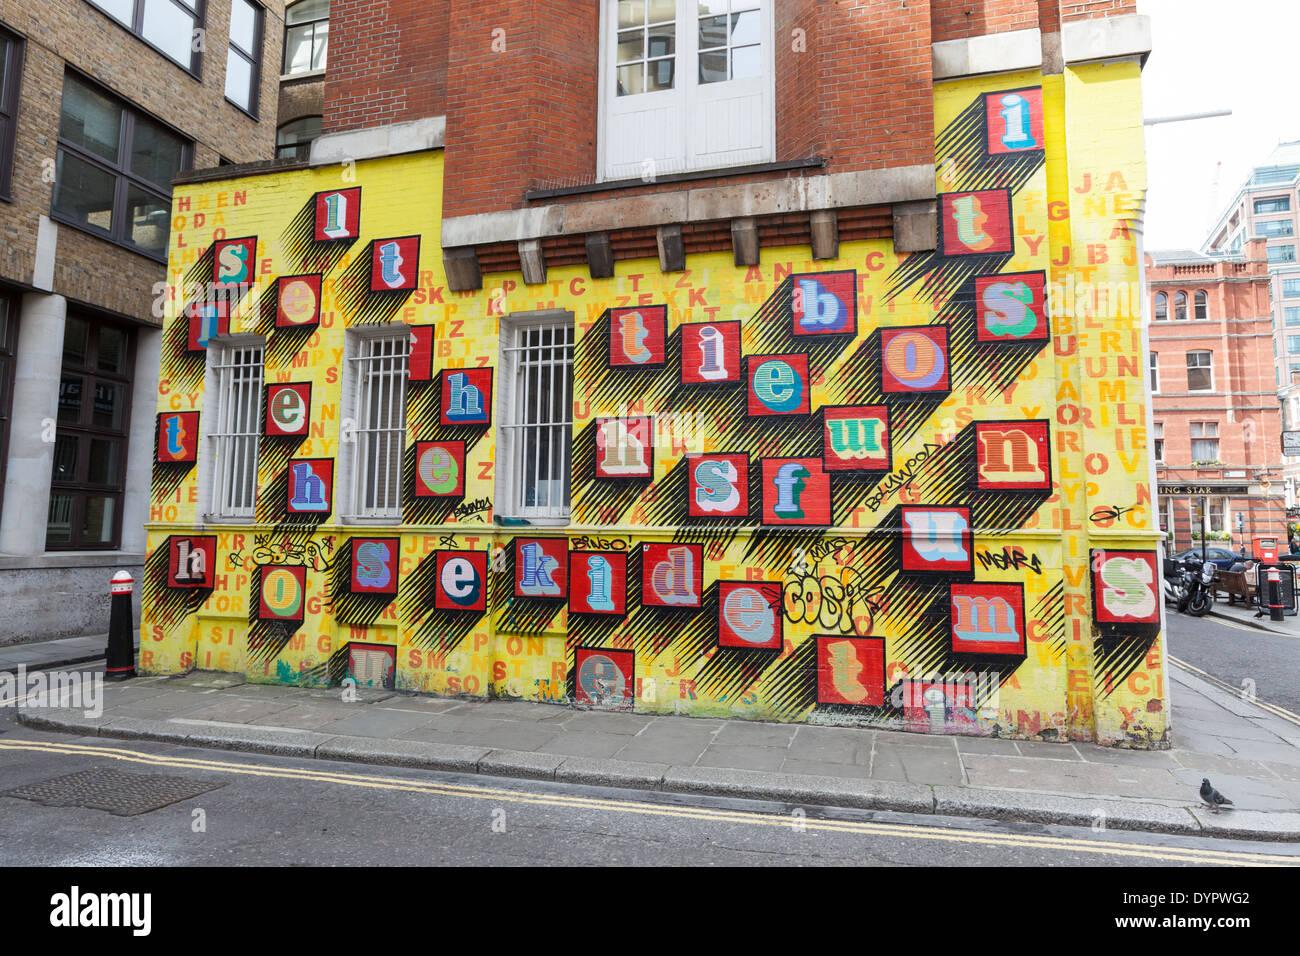 Mural by Ben Eine on Middlesex Street, London. - Stock Image